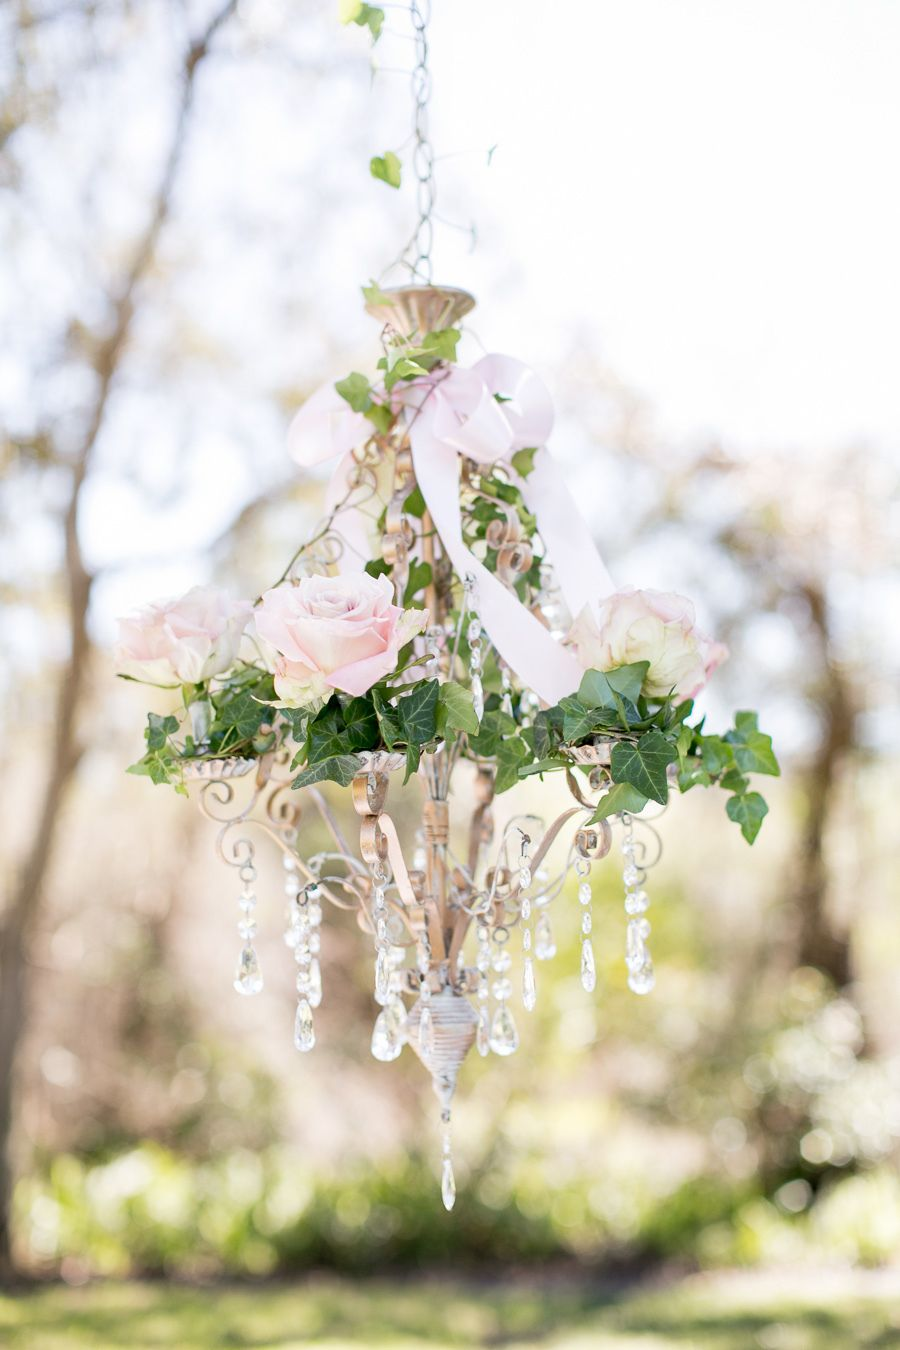 Photography: Ashley McCormick Photography - www.ashleymccormick.com Florist: Freshly Picked - freshlypickedflowers.com   Read More on SMP: http://www.stylemepretty.com/2014/04/25/spring-garden-bridal-shower/